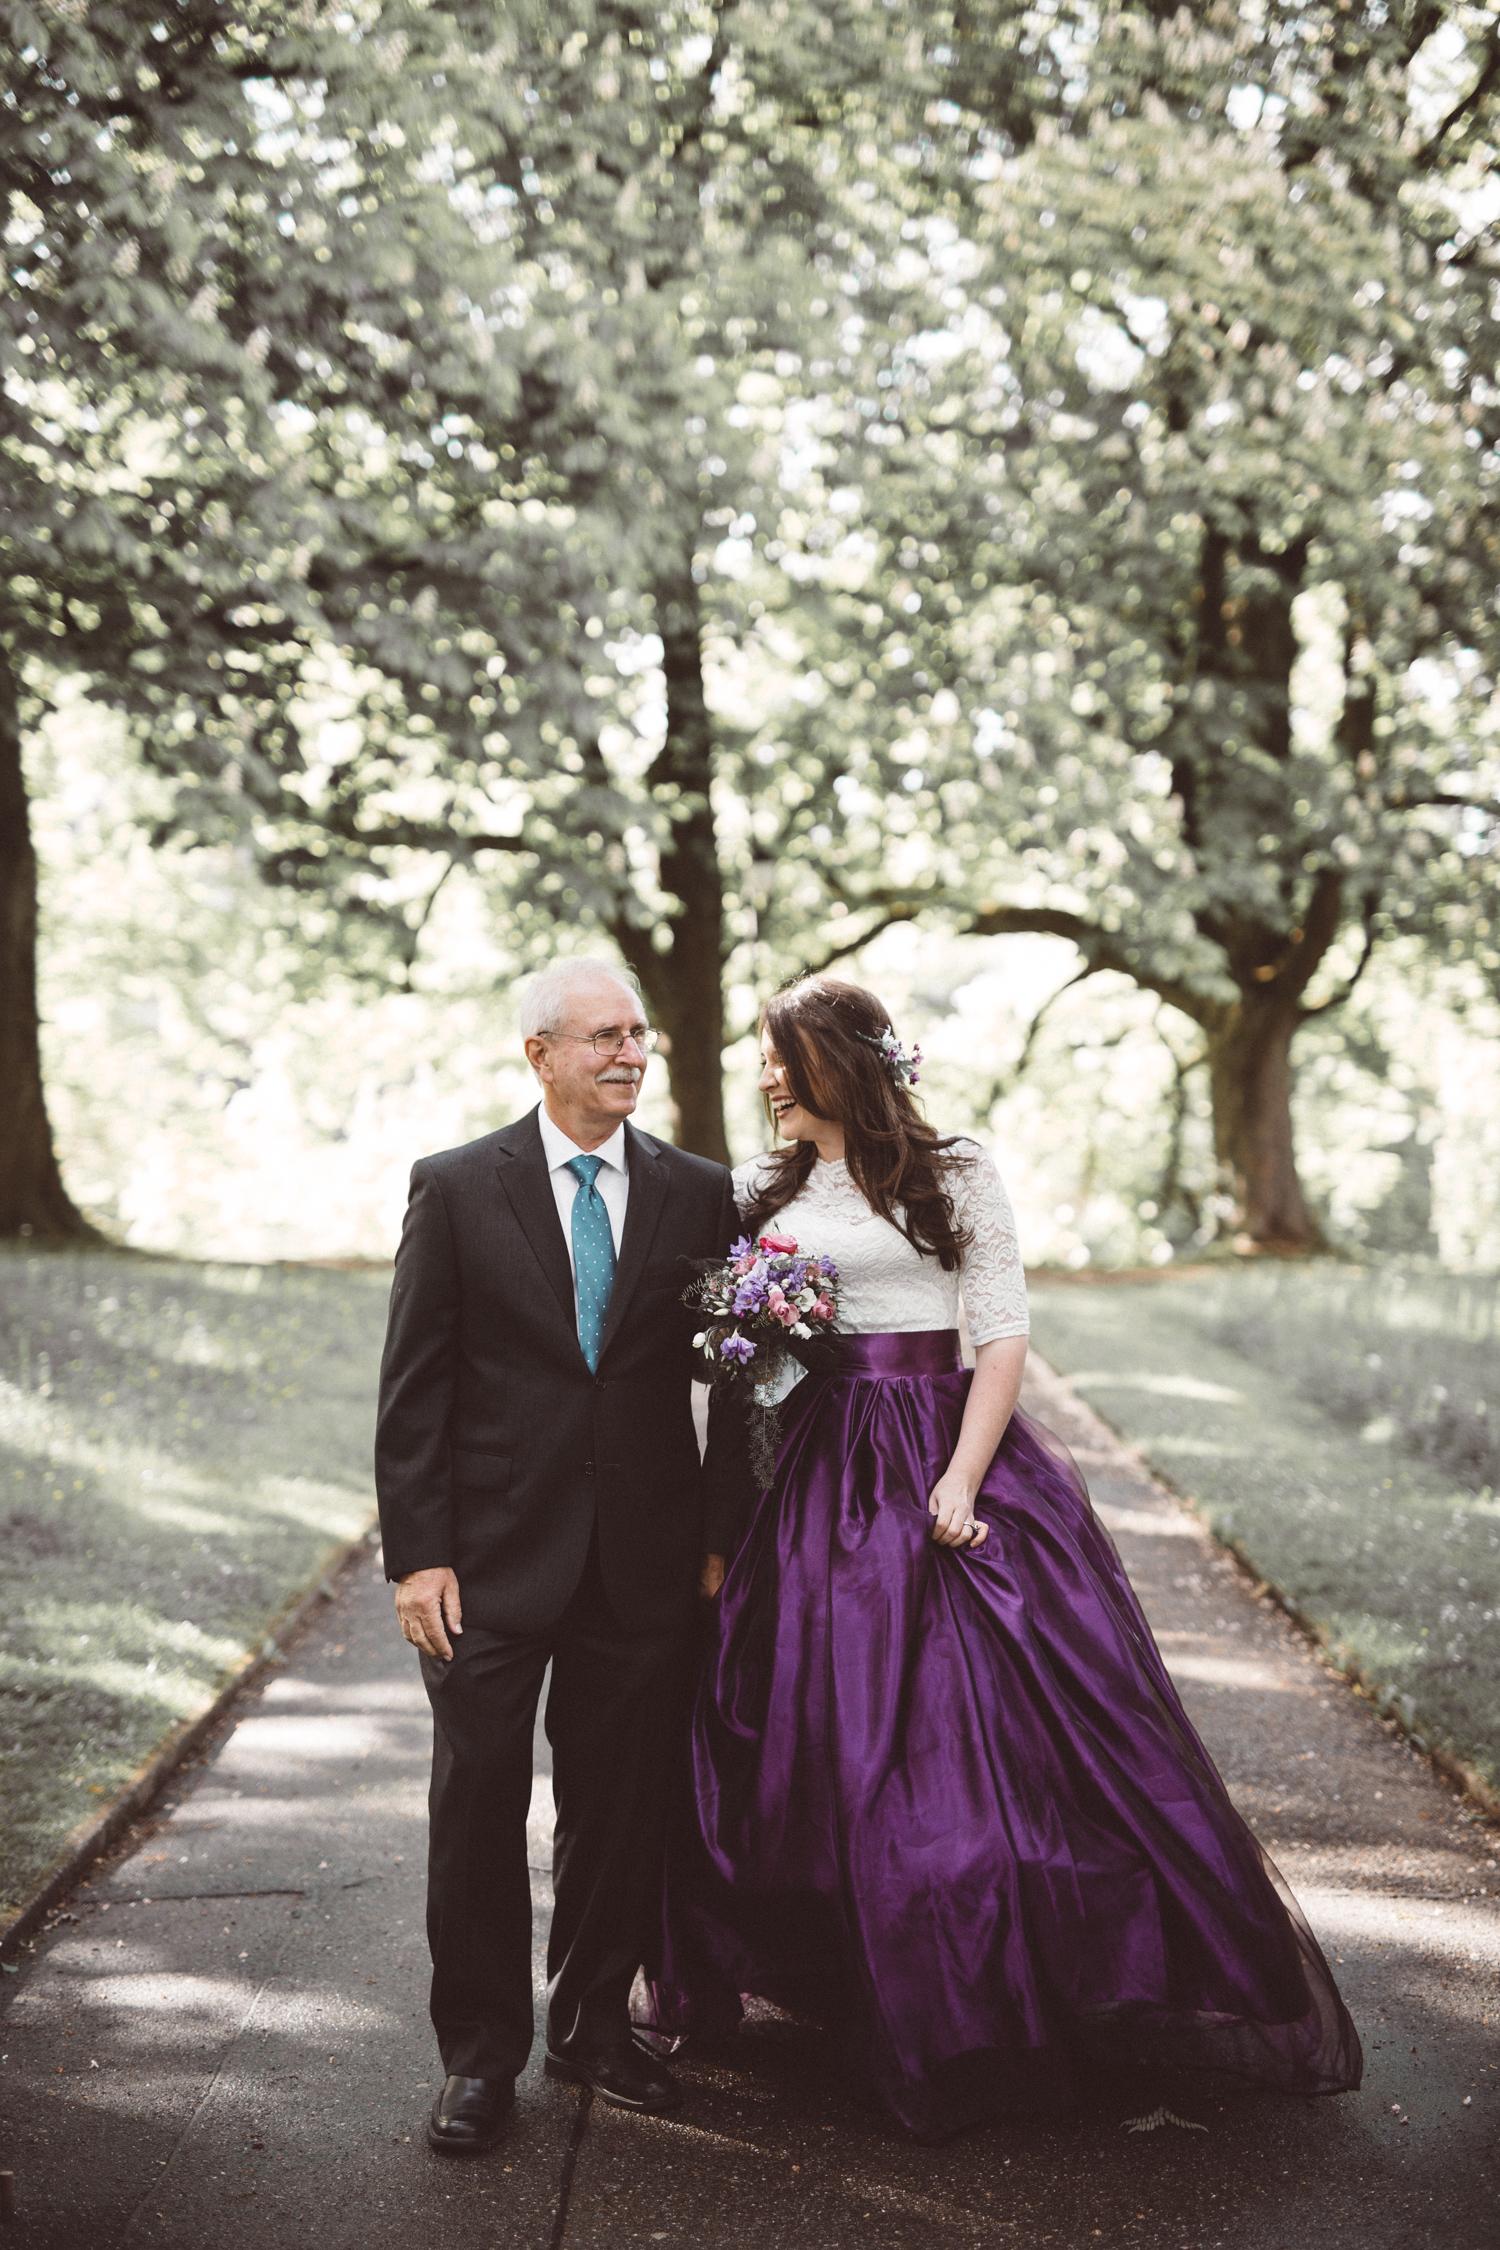 kdp_courtney&sean_wed_web-17.jpg